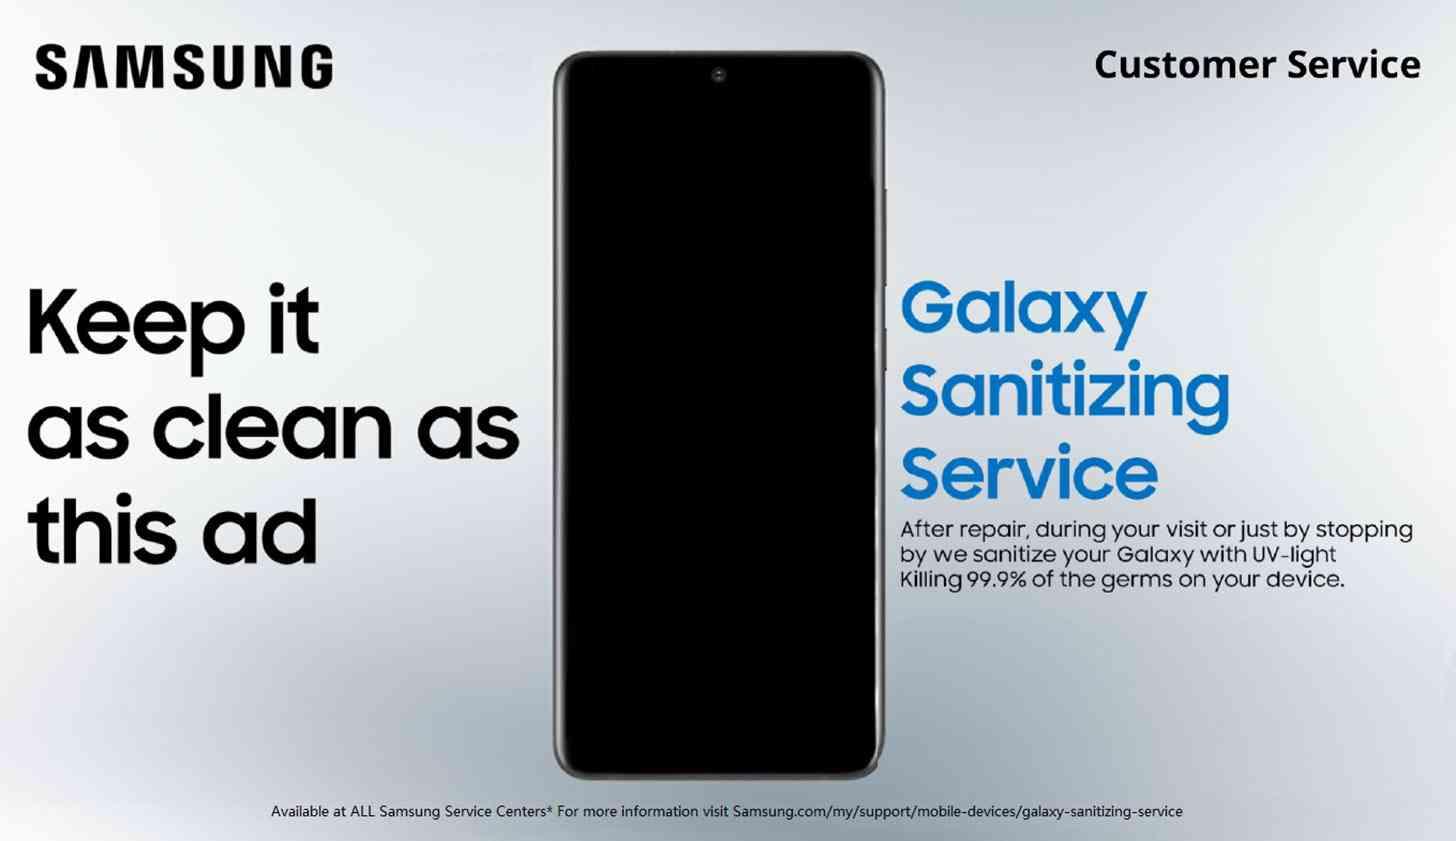 Samsung Galaxy Sanitizing Service